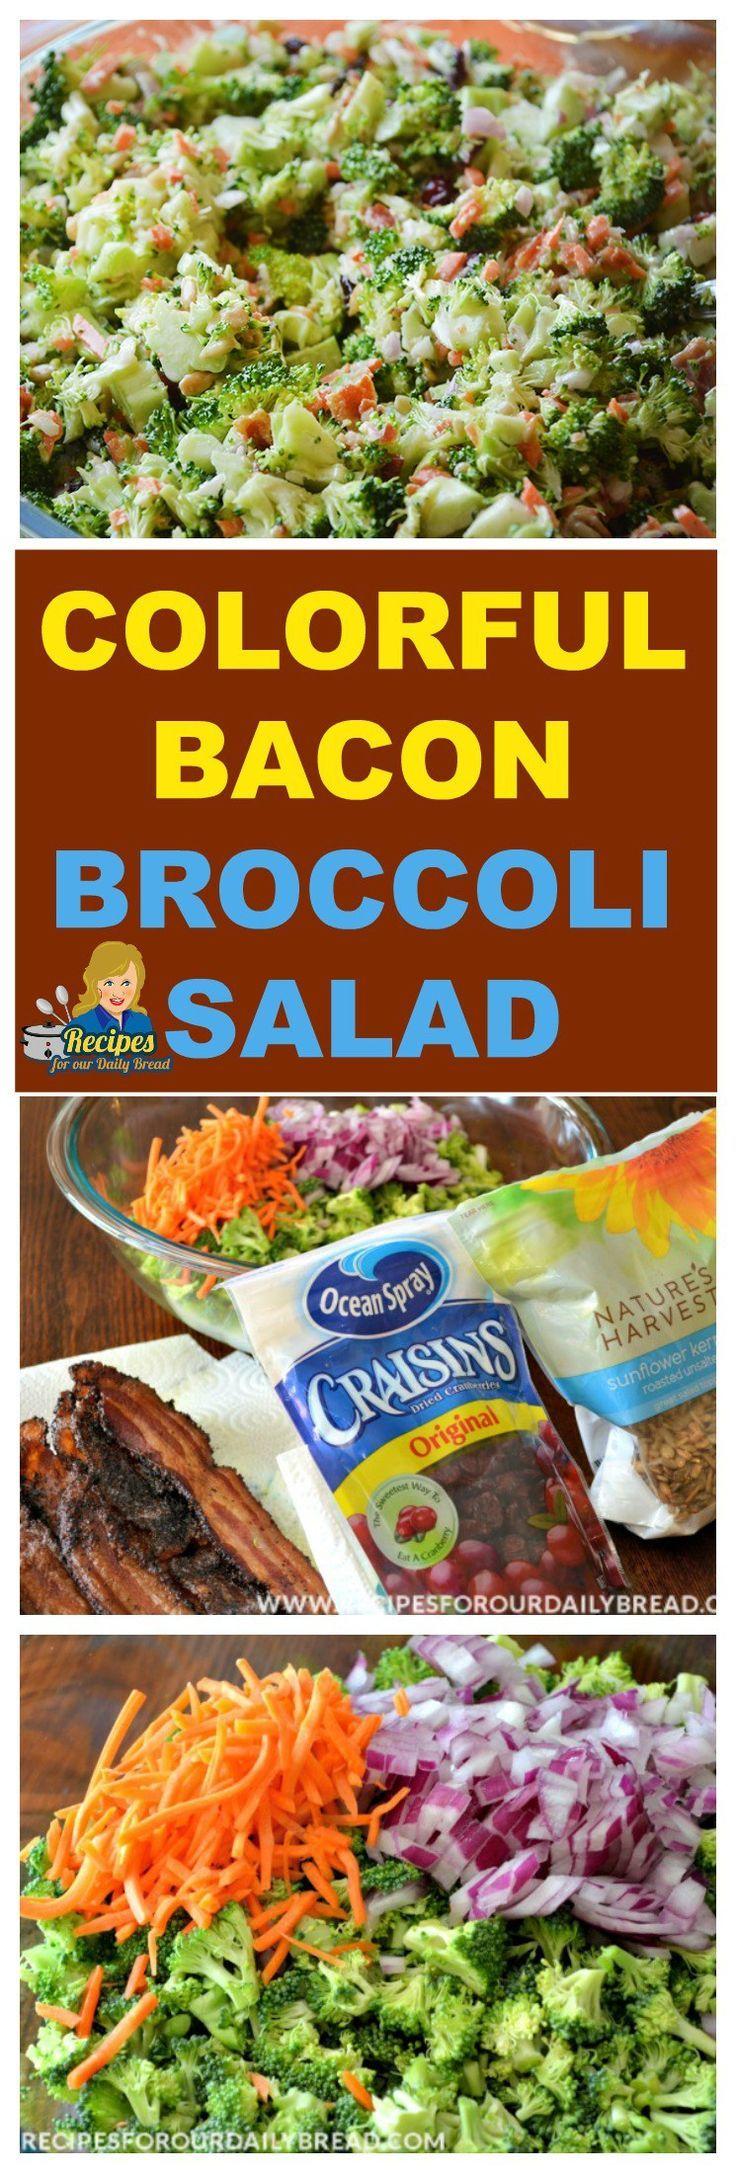 How to make awesome colorful broccoli salad with bacon  How to make awesome colorful bro...#Awesome